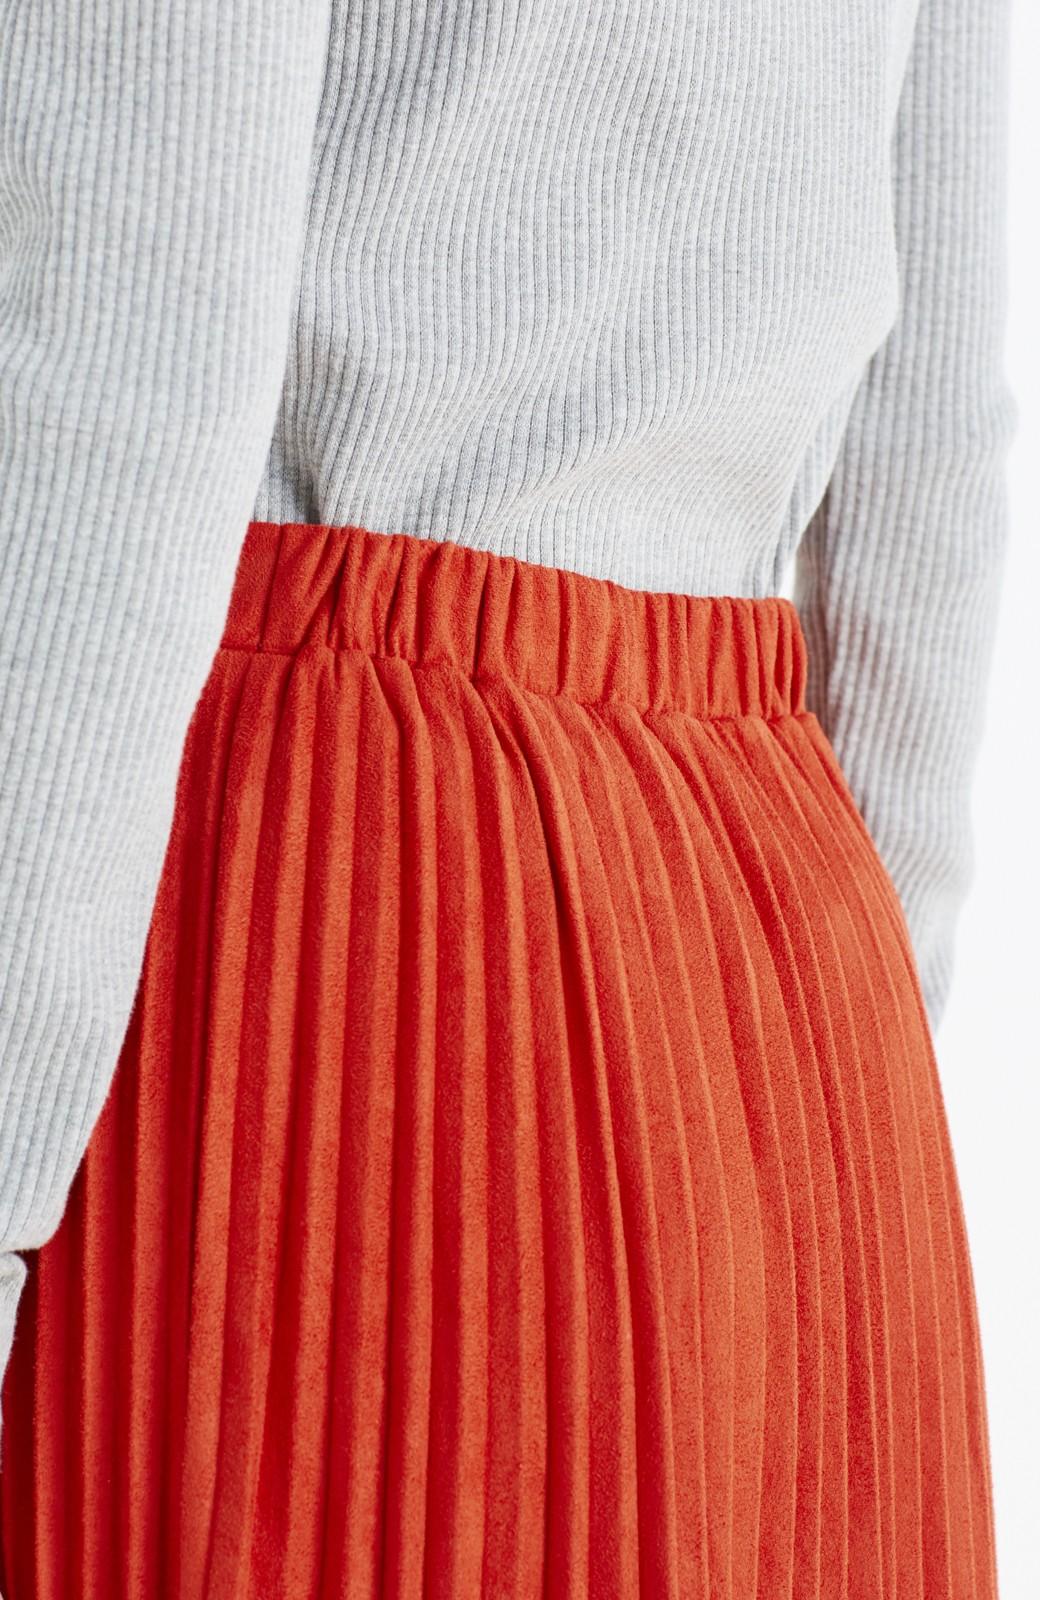 haco! 楽して女っぽい フェイクスエードのプリーツスカート  by que made me <オレンジ系その他>の商品写真11